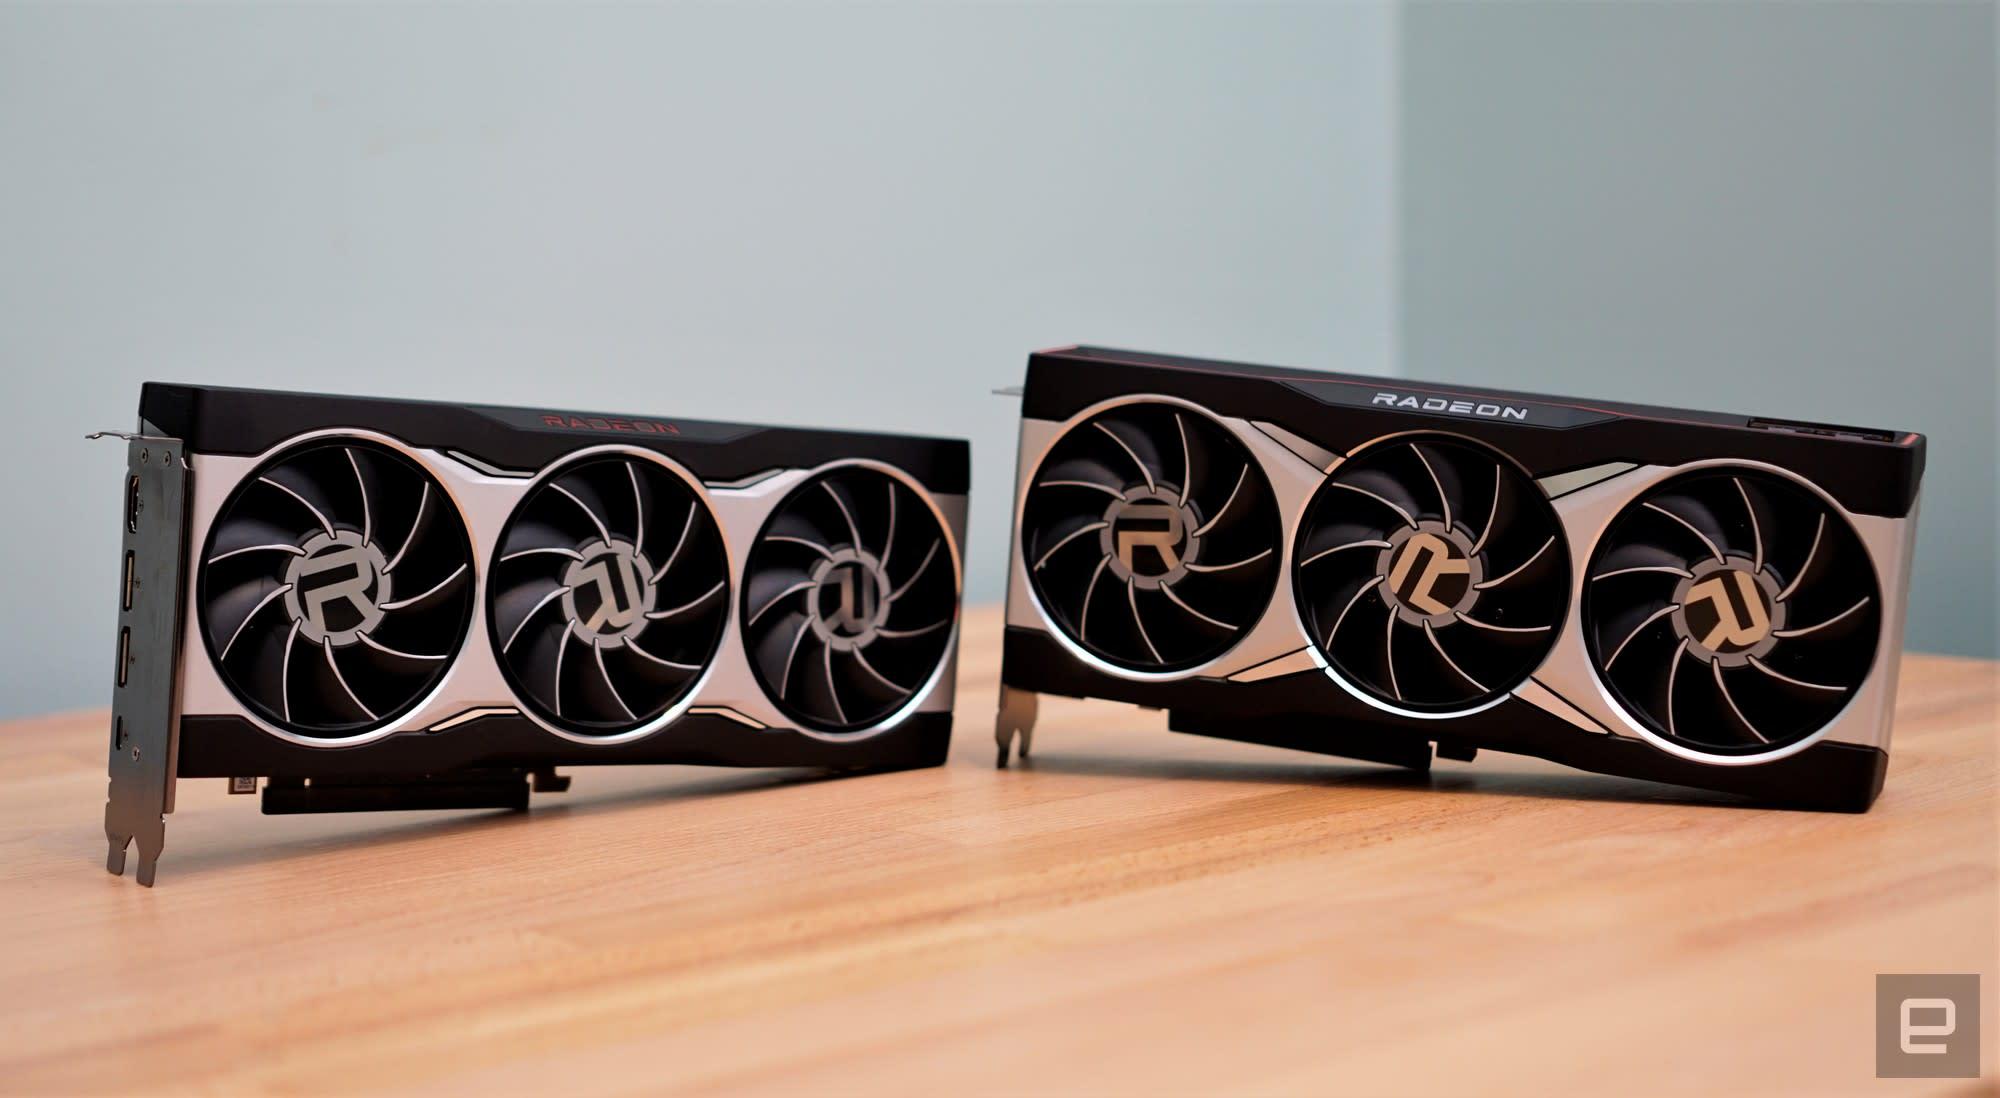 AMD's Radeon RX 6800 and 6800 XT